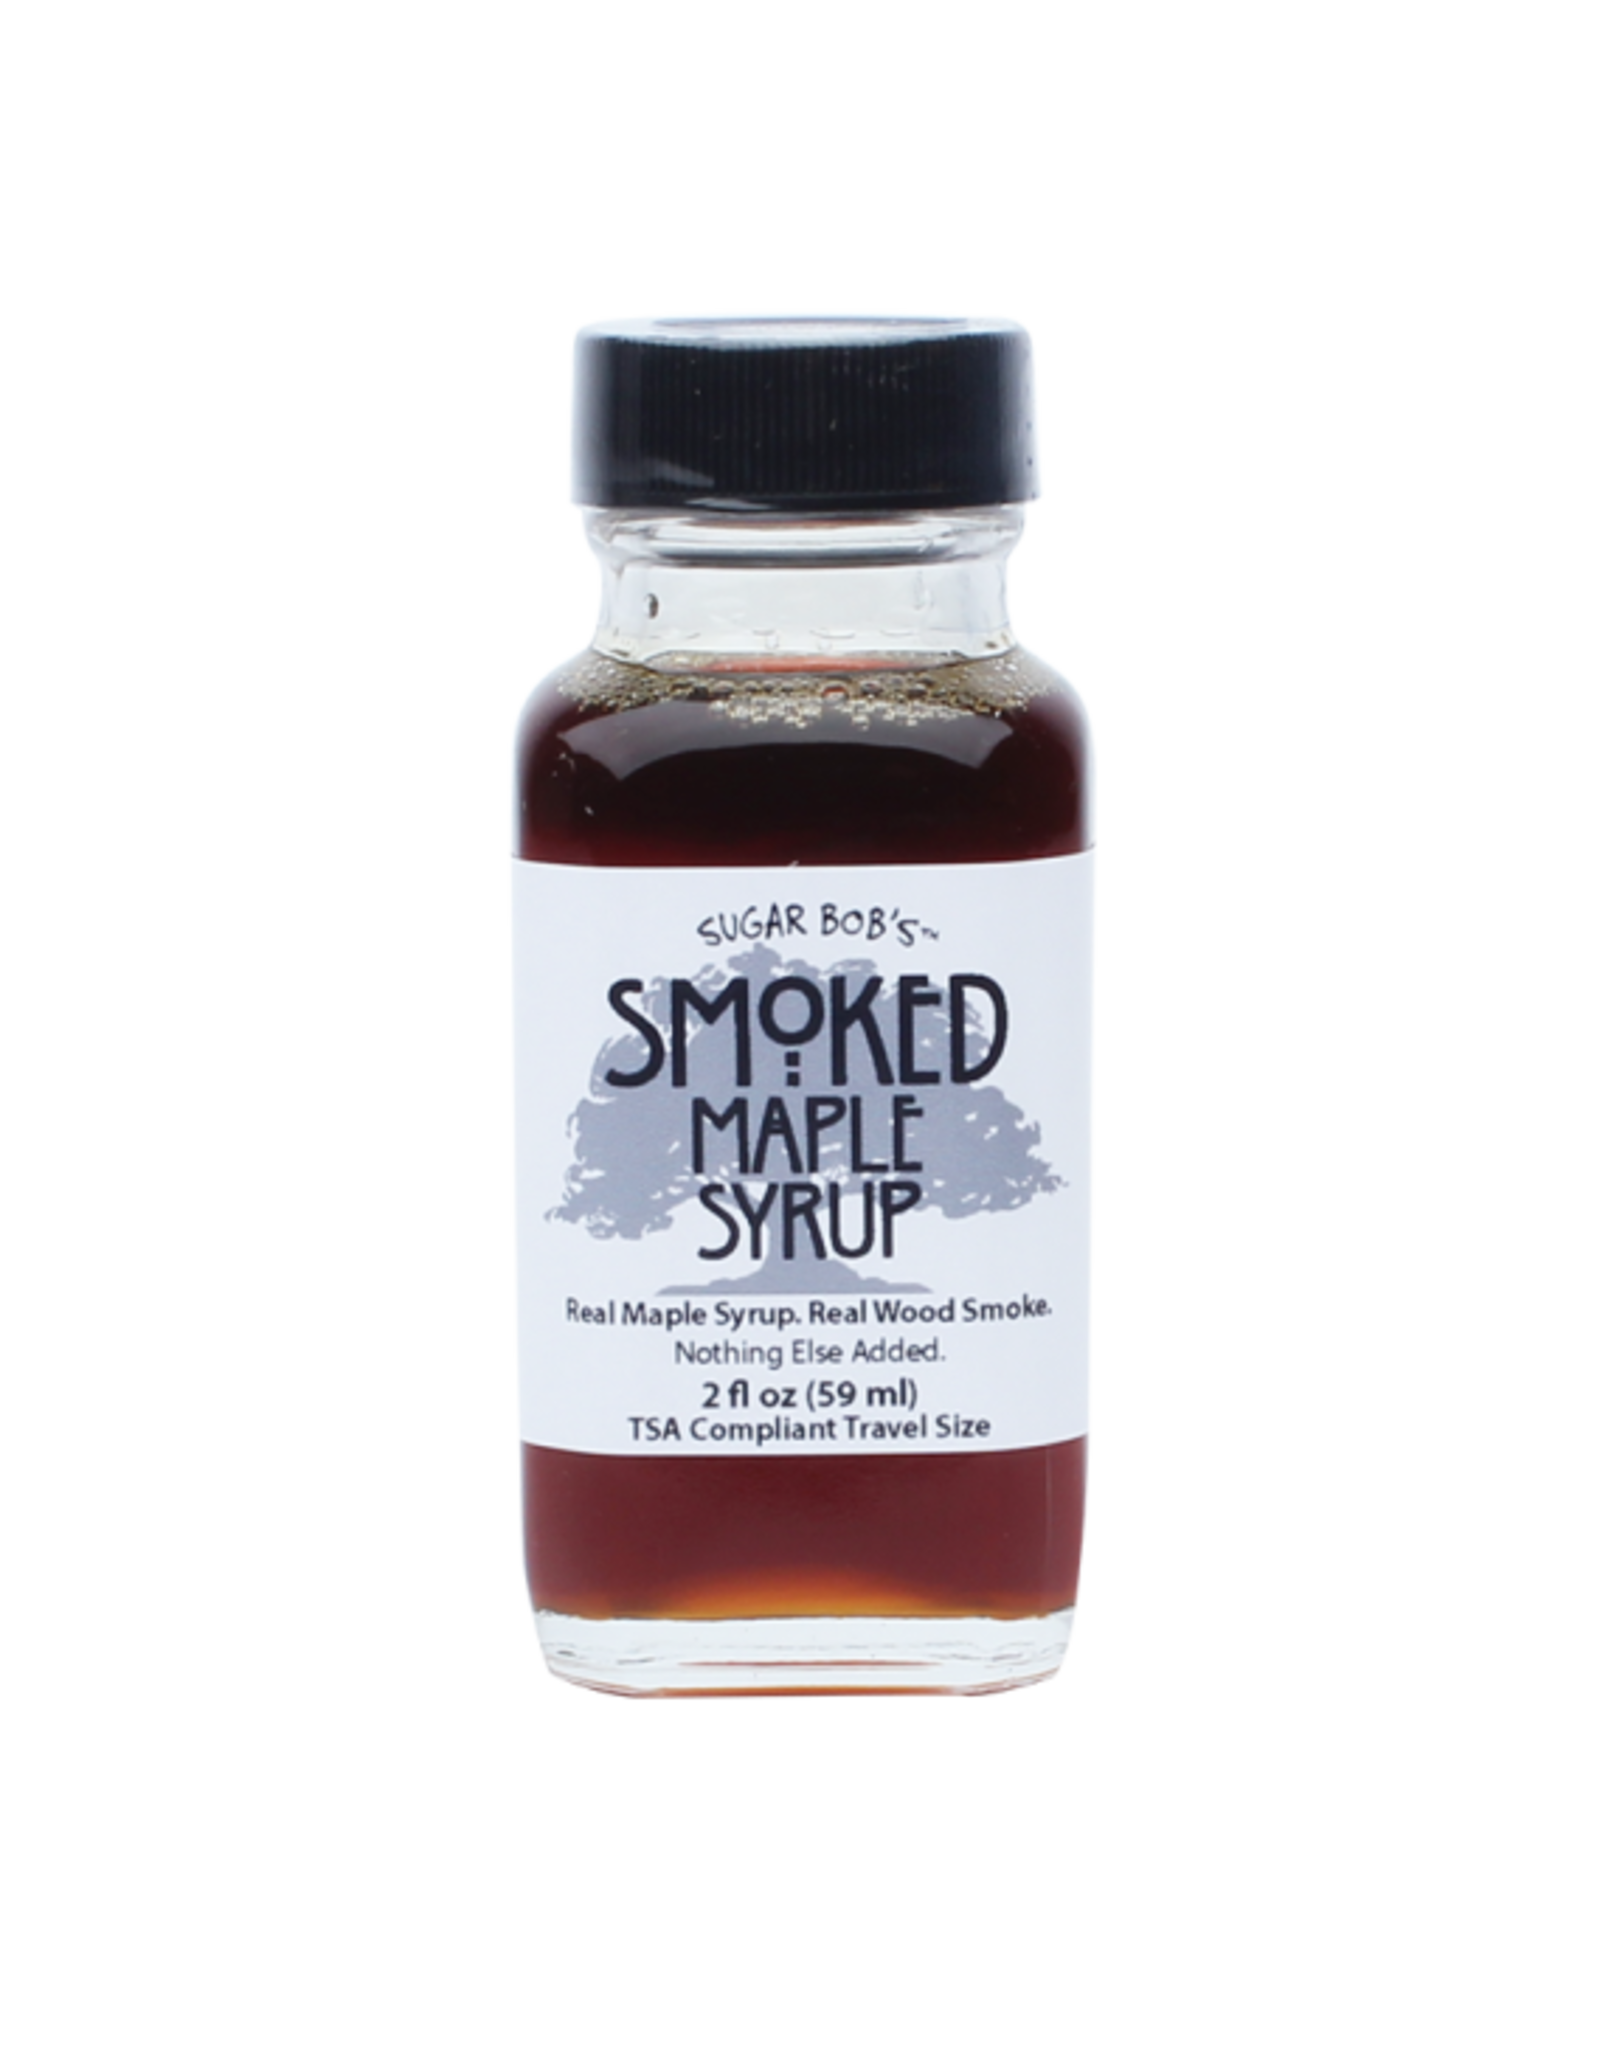 Sugar Bob's Sugar Bob's Smoked Maple Syrup 60mL